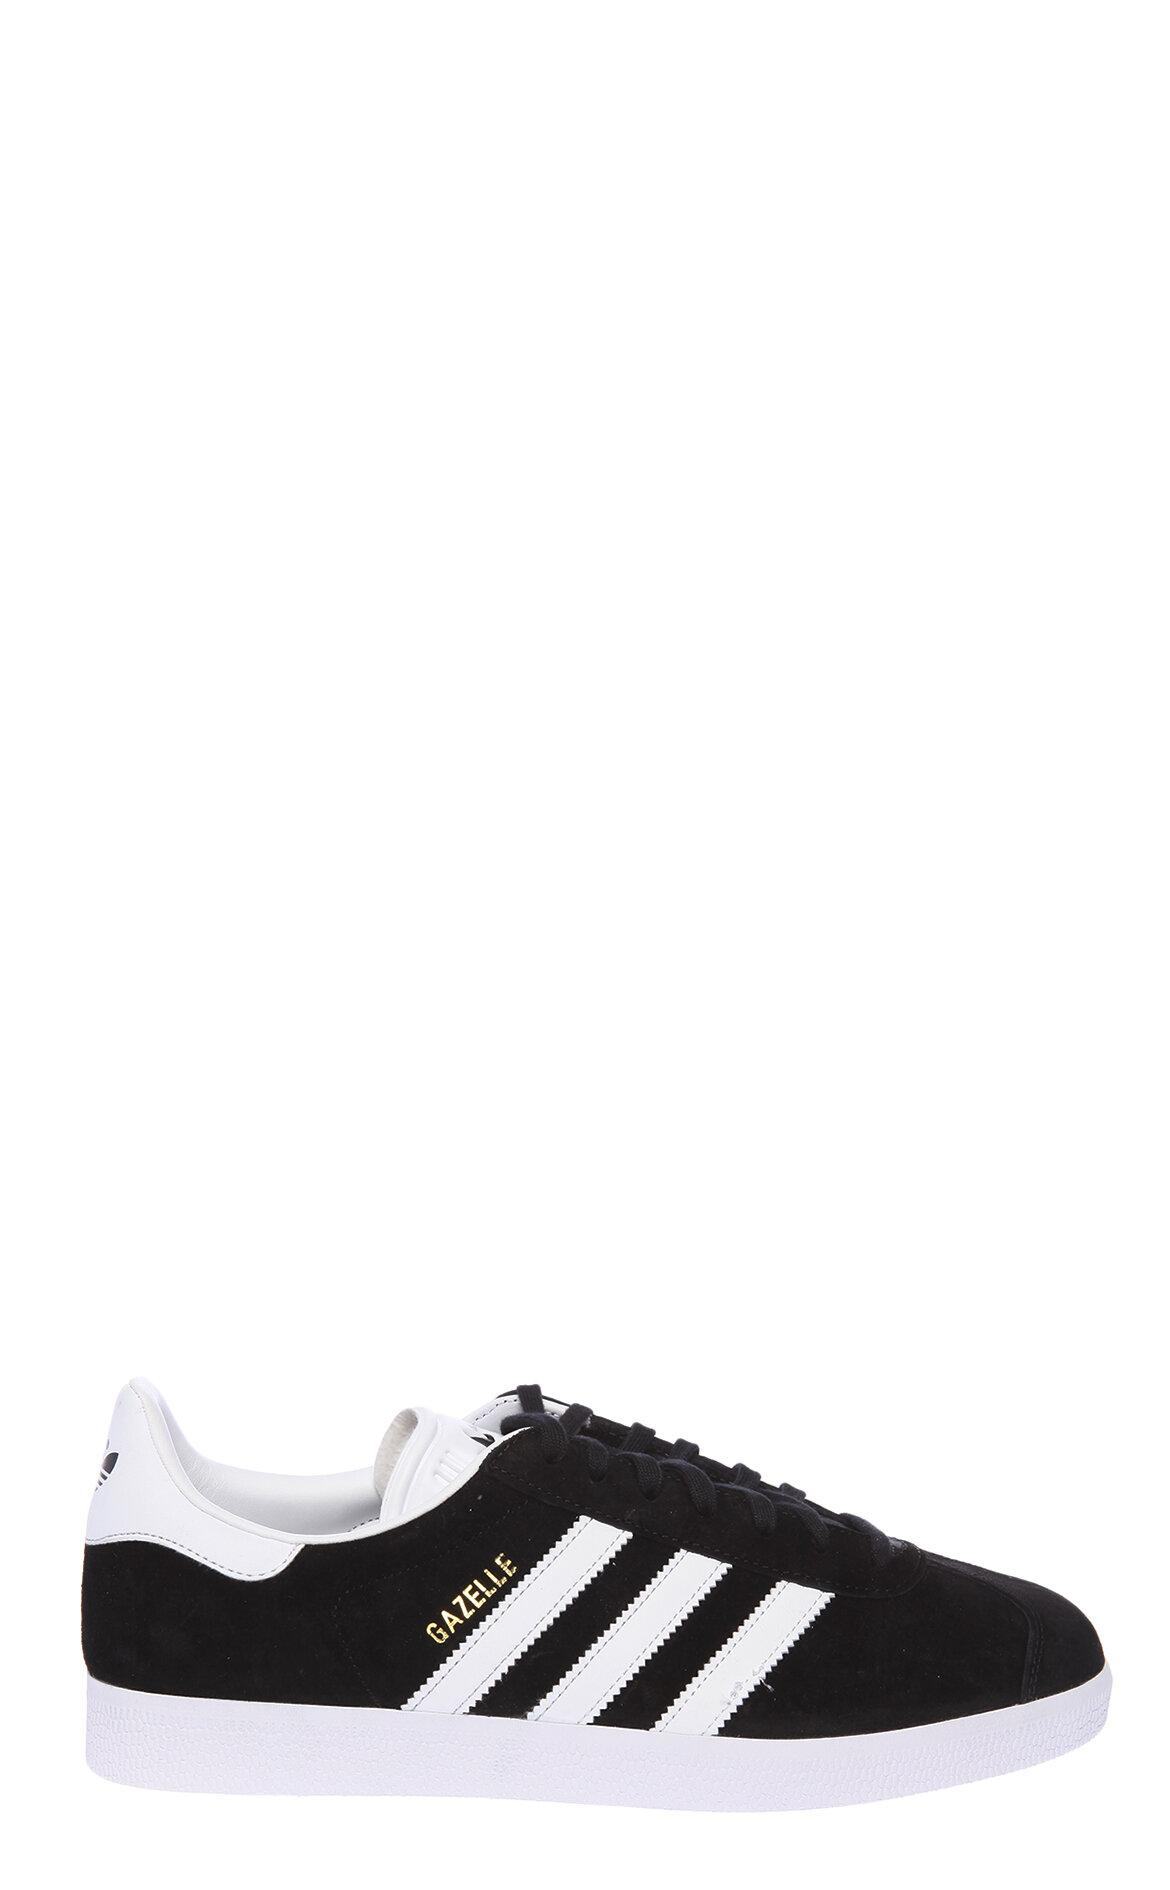 adidas originals Gazelle Spor Ayakkabı